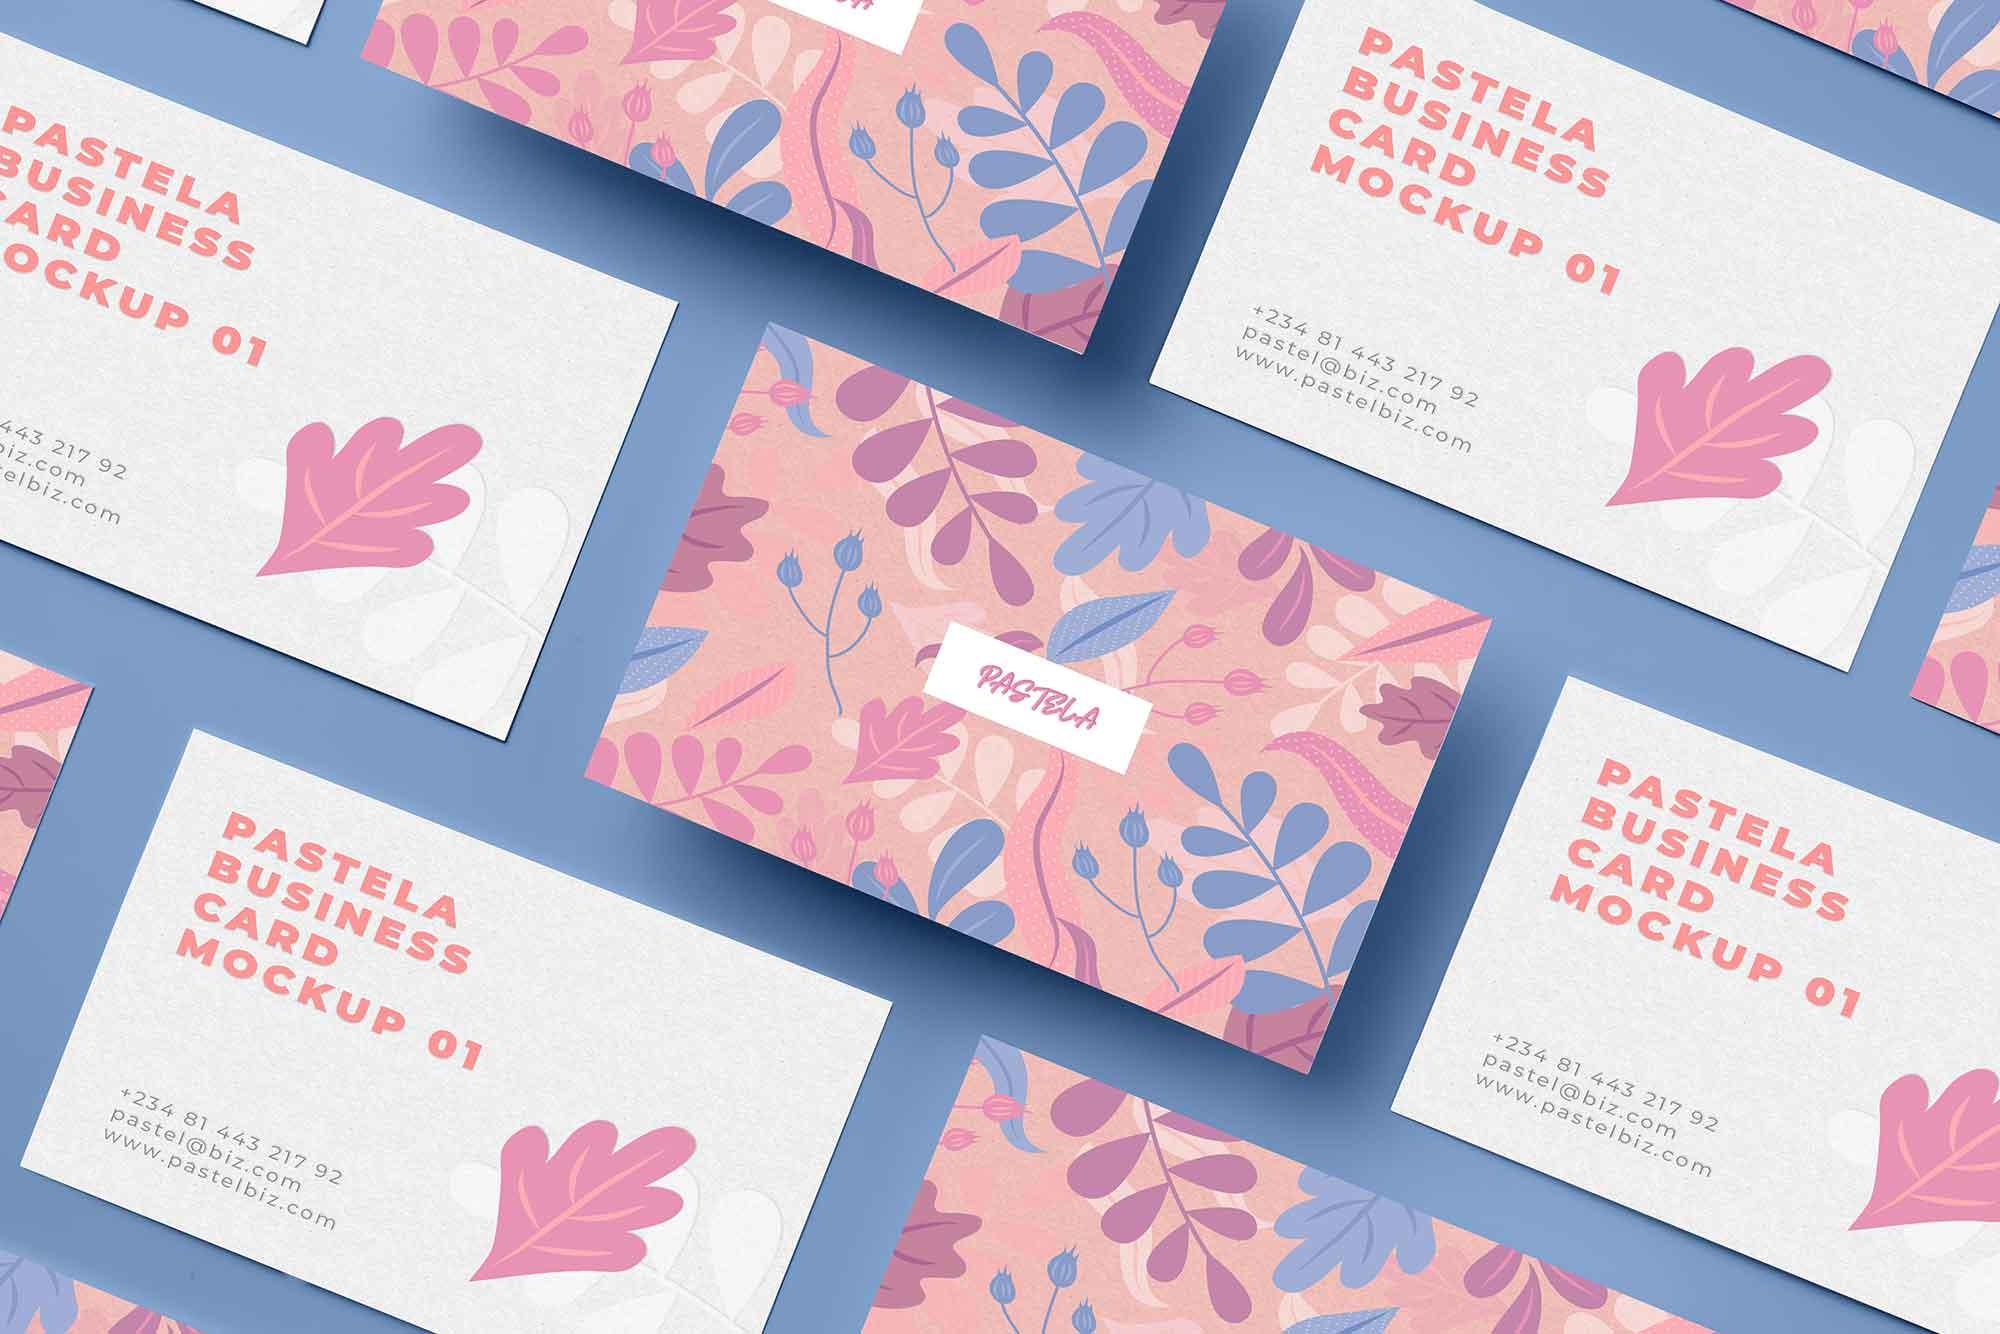 Business Card Mockup 14